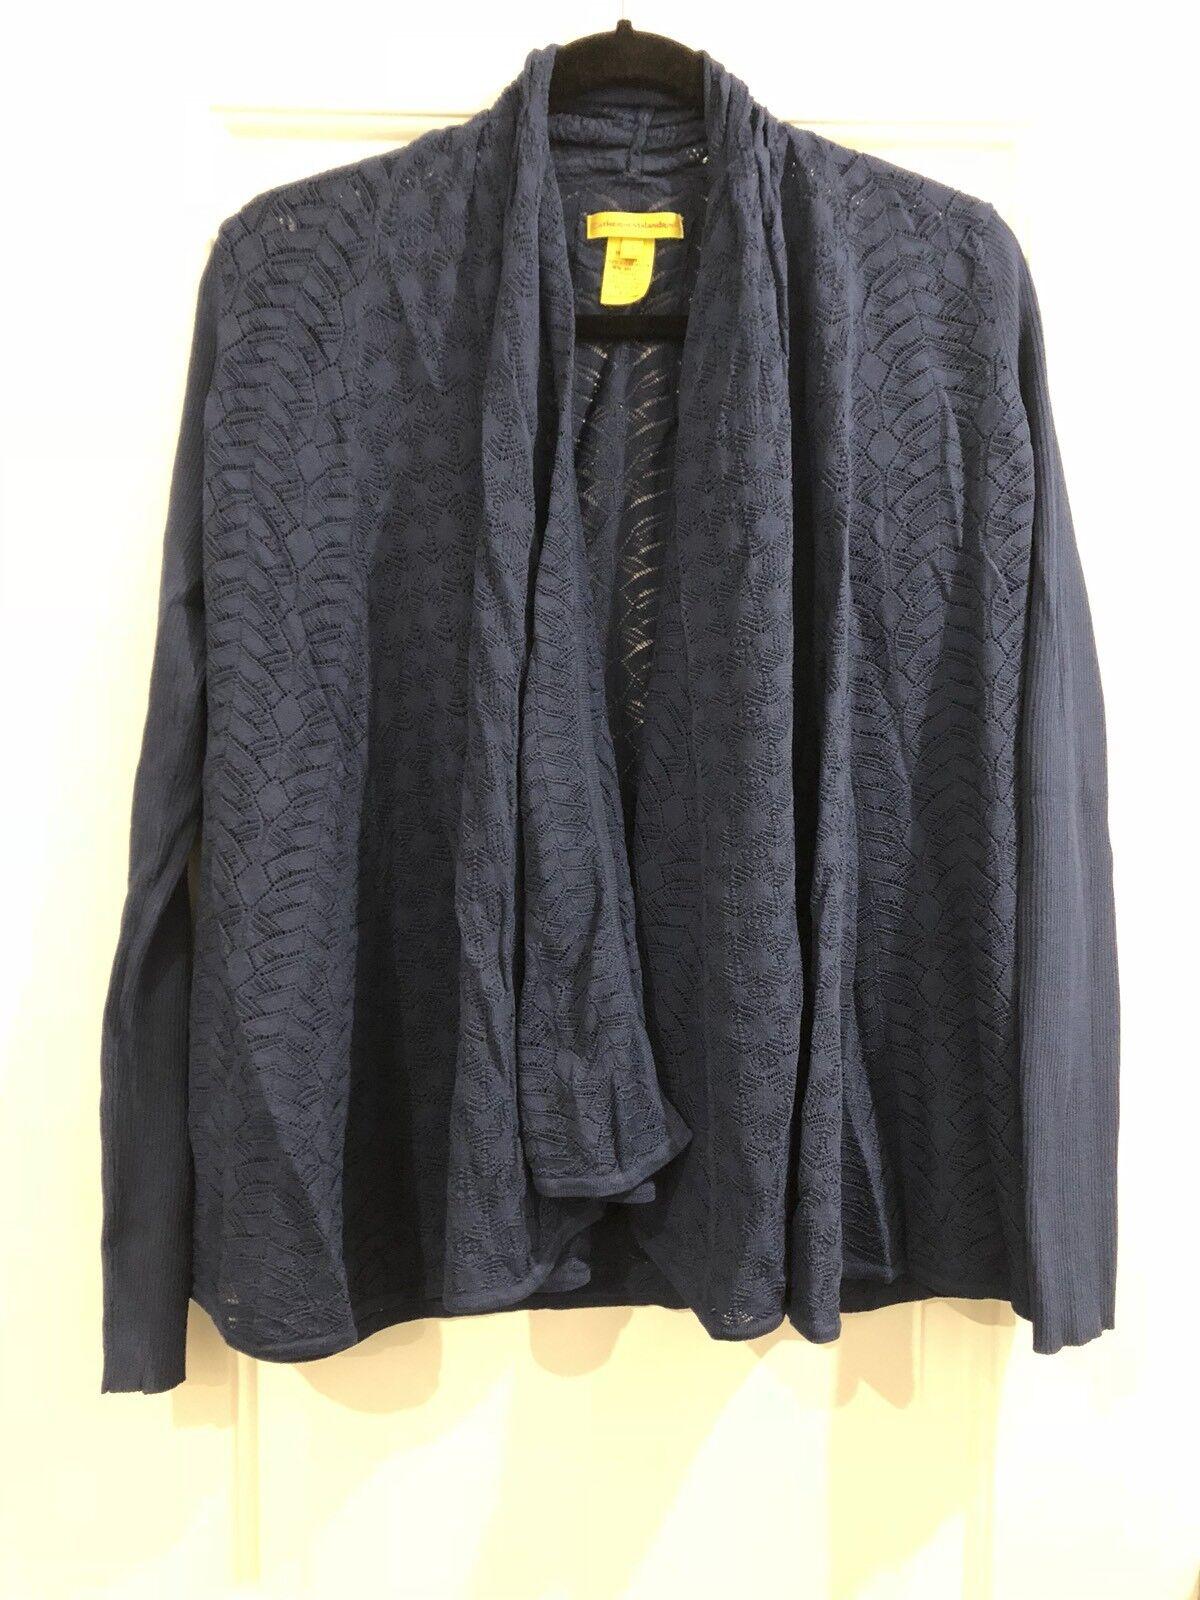 New Catherine Malandrino Womens Sweater Large Navy bluee Cardigan Open Front Top